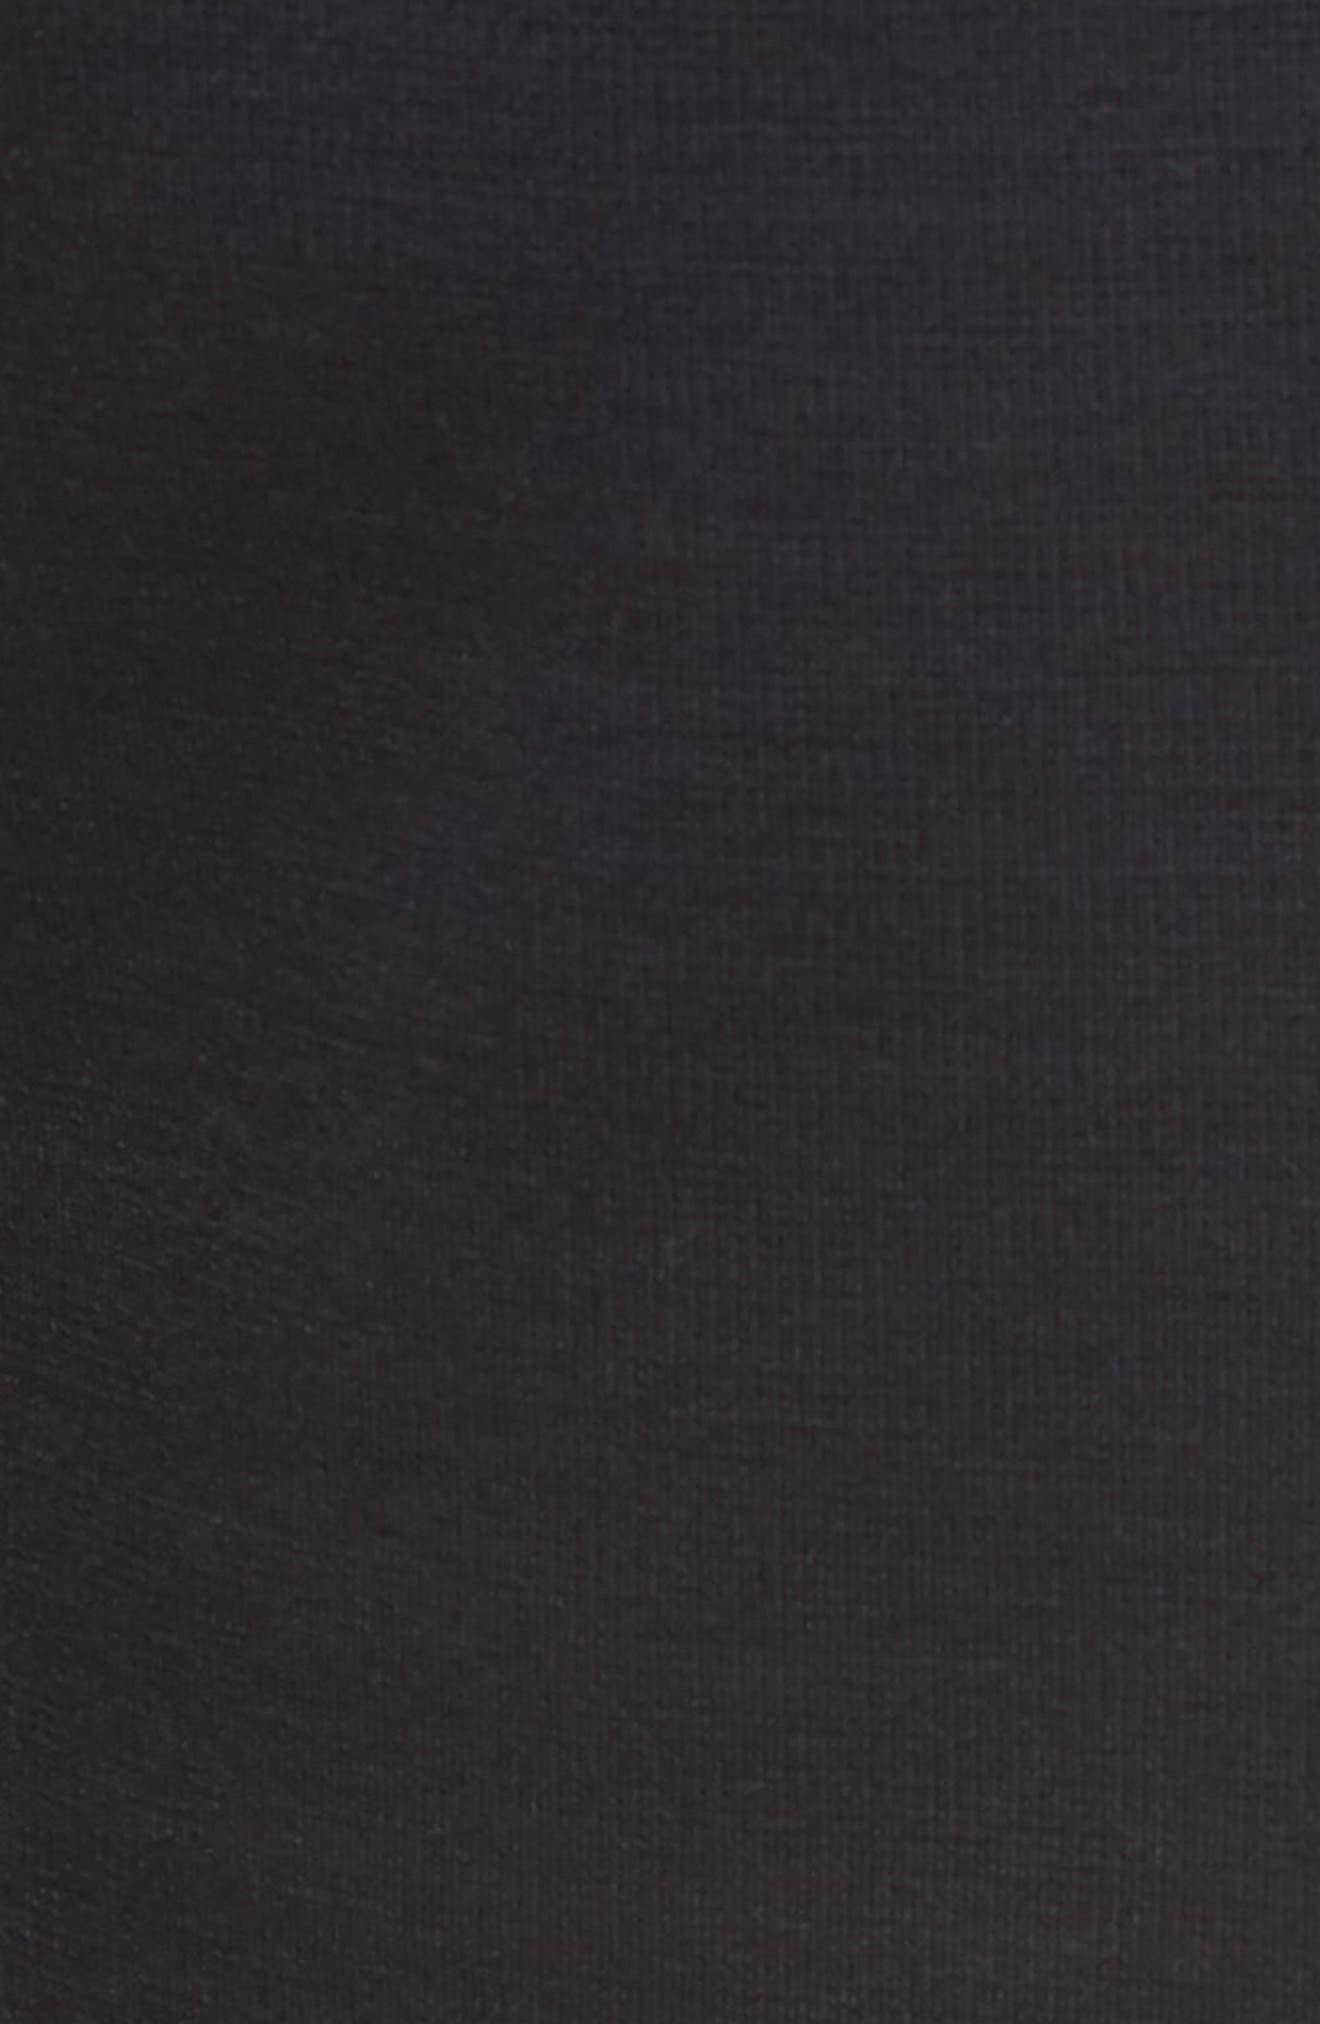 Banks-J Wool & Cotton Joggers,                             Alternate thumbnail 5, color,                             OPEN BLUE